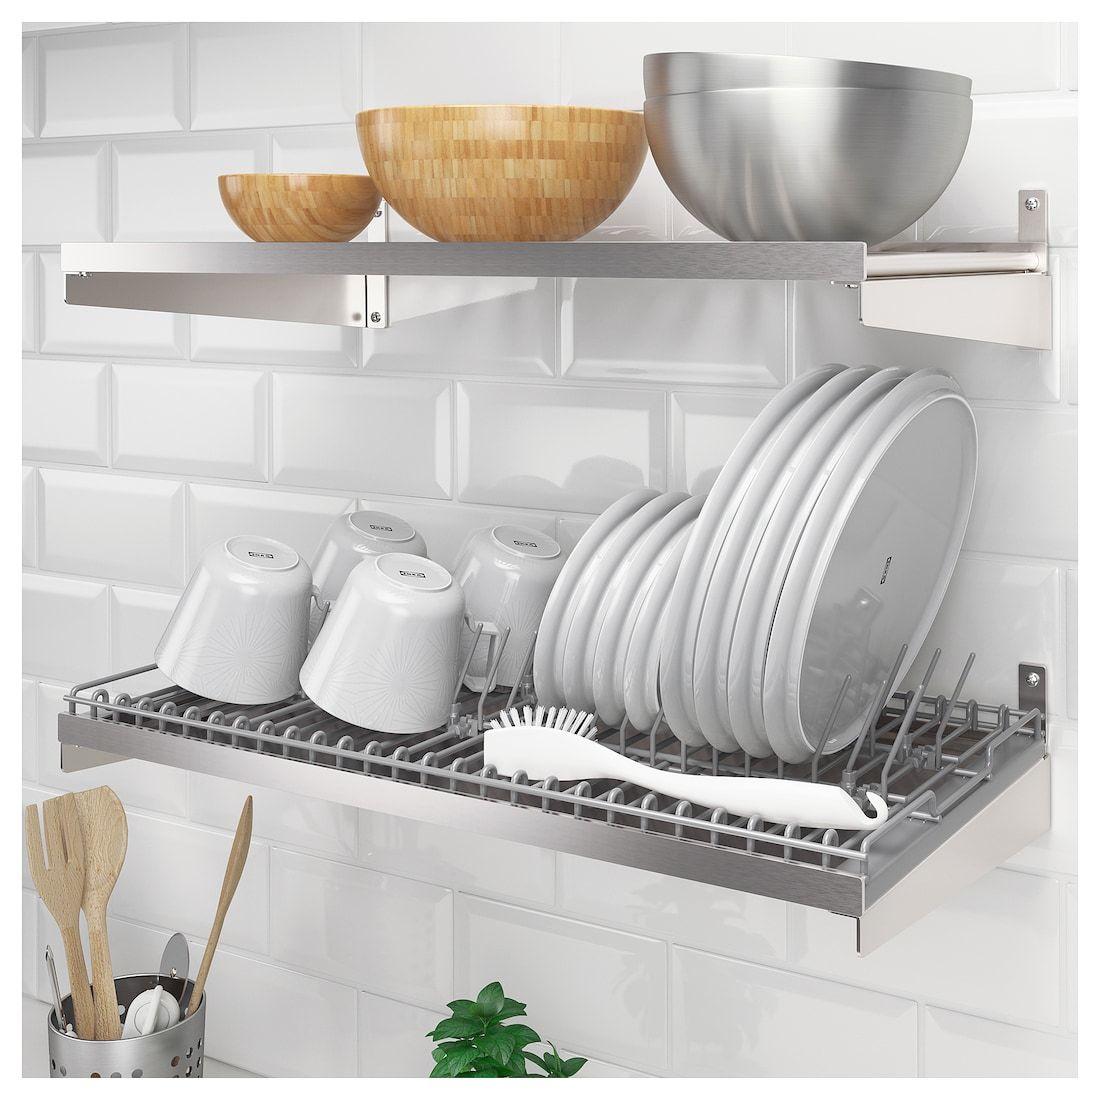 Ikea Kungsfors Dish Drainer In 2020 Dish Drainers Kitchen Storage Kitchen Countertops